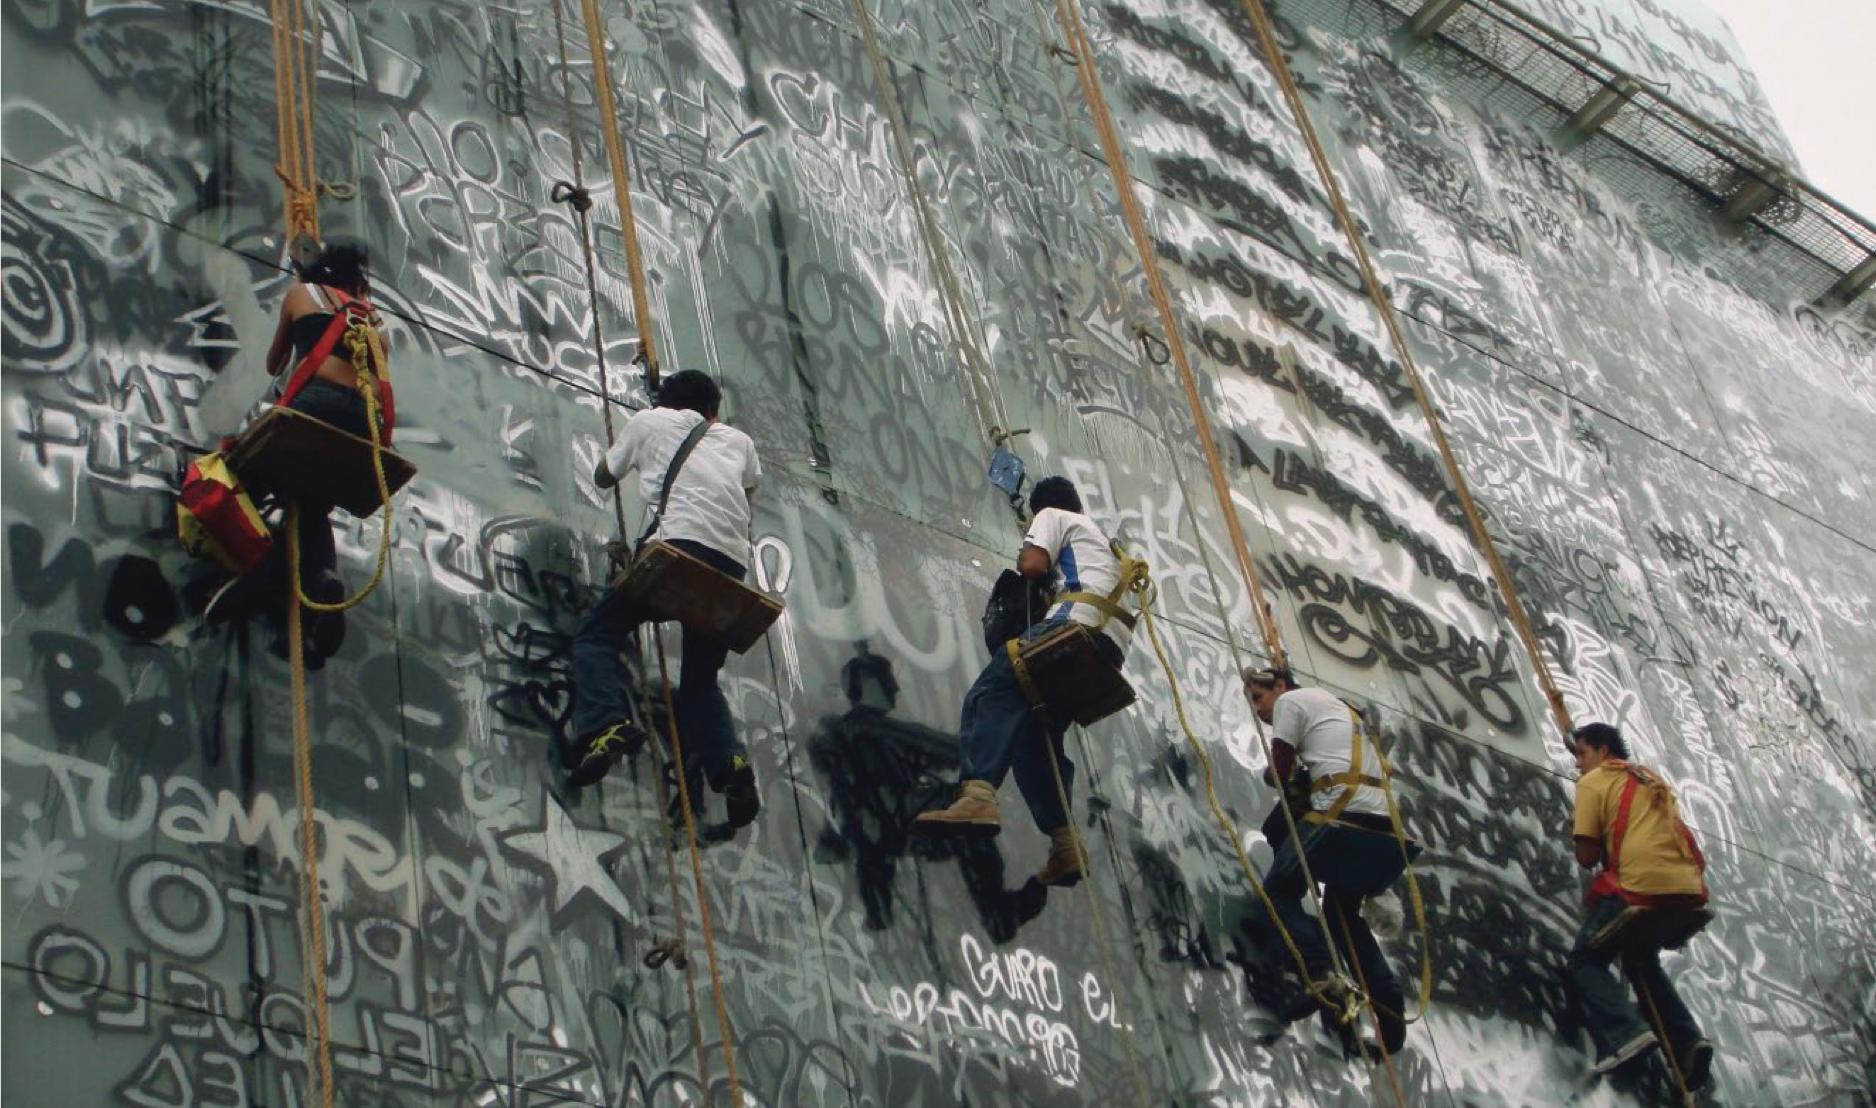 Tania Candiani, Habita Intervenido, 2008. Stencil and spray paint on glass. Hotel Habita, Mexico City. Courtesy of the artist.